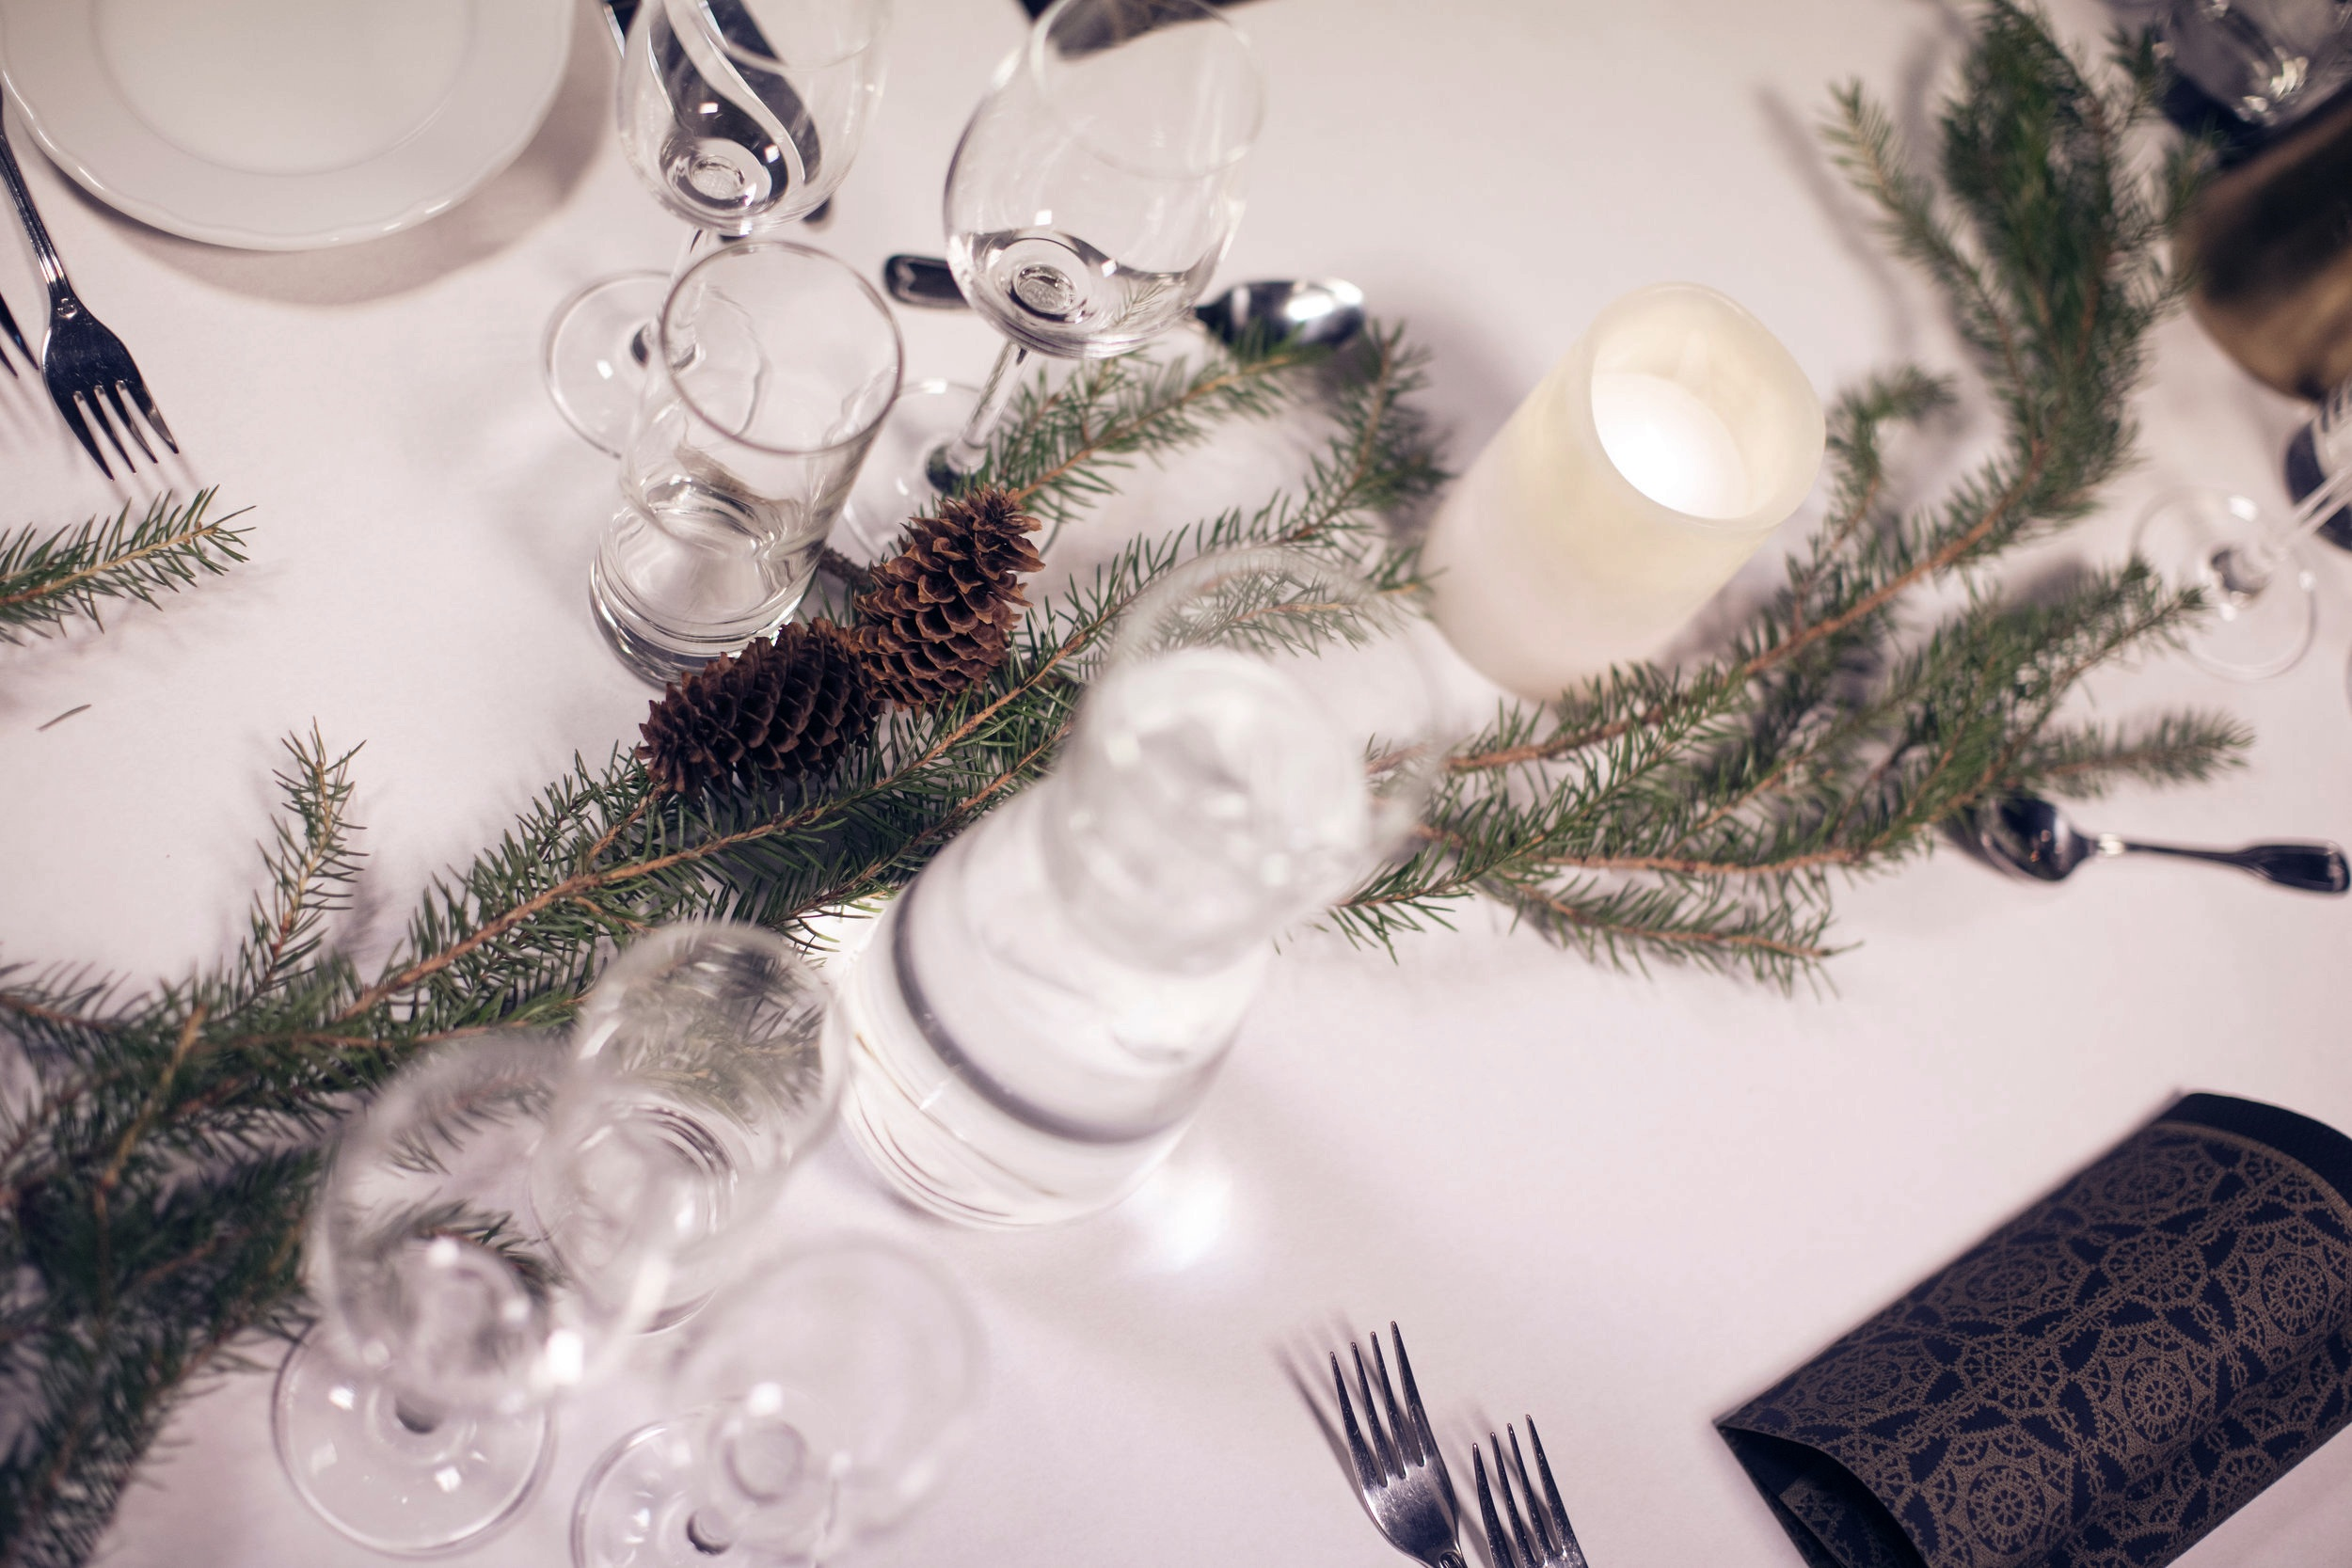 Bestill årets julebord - Sikre din dato nå!